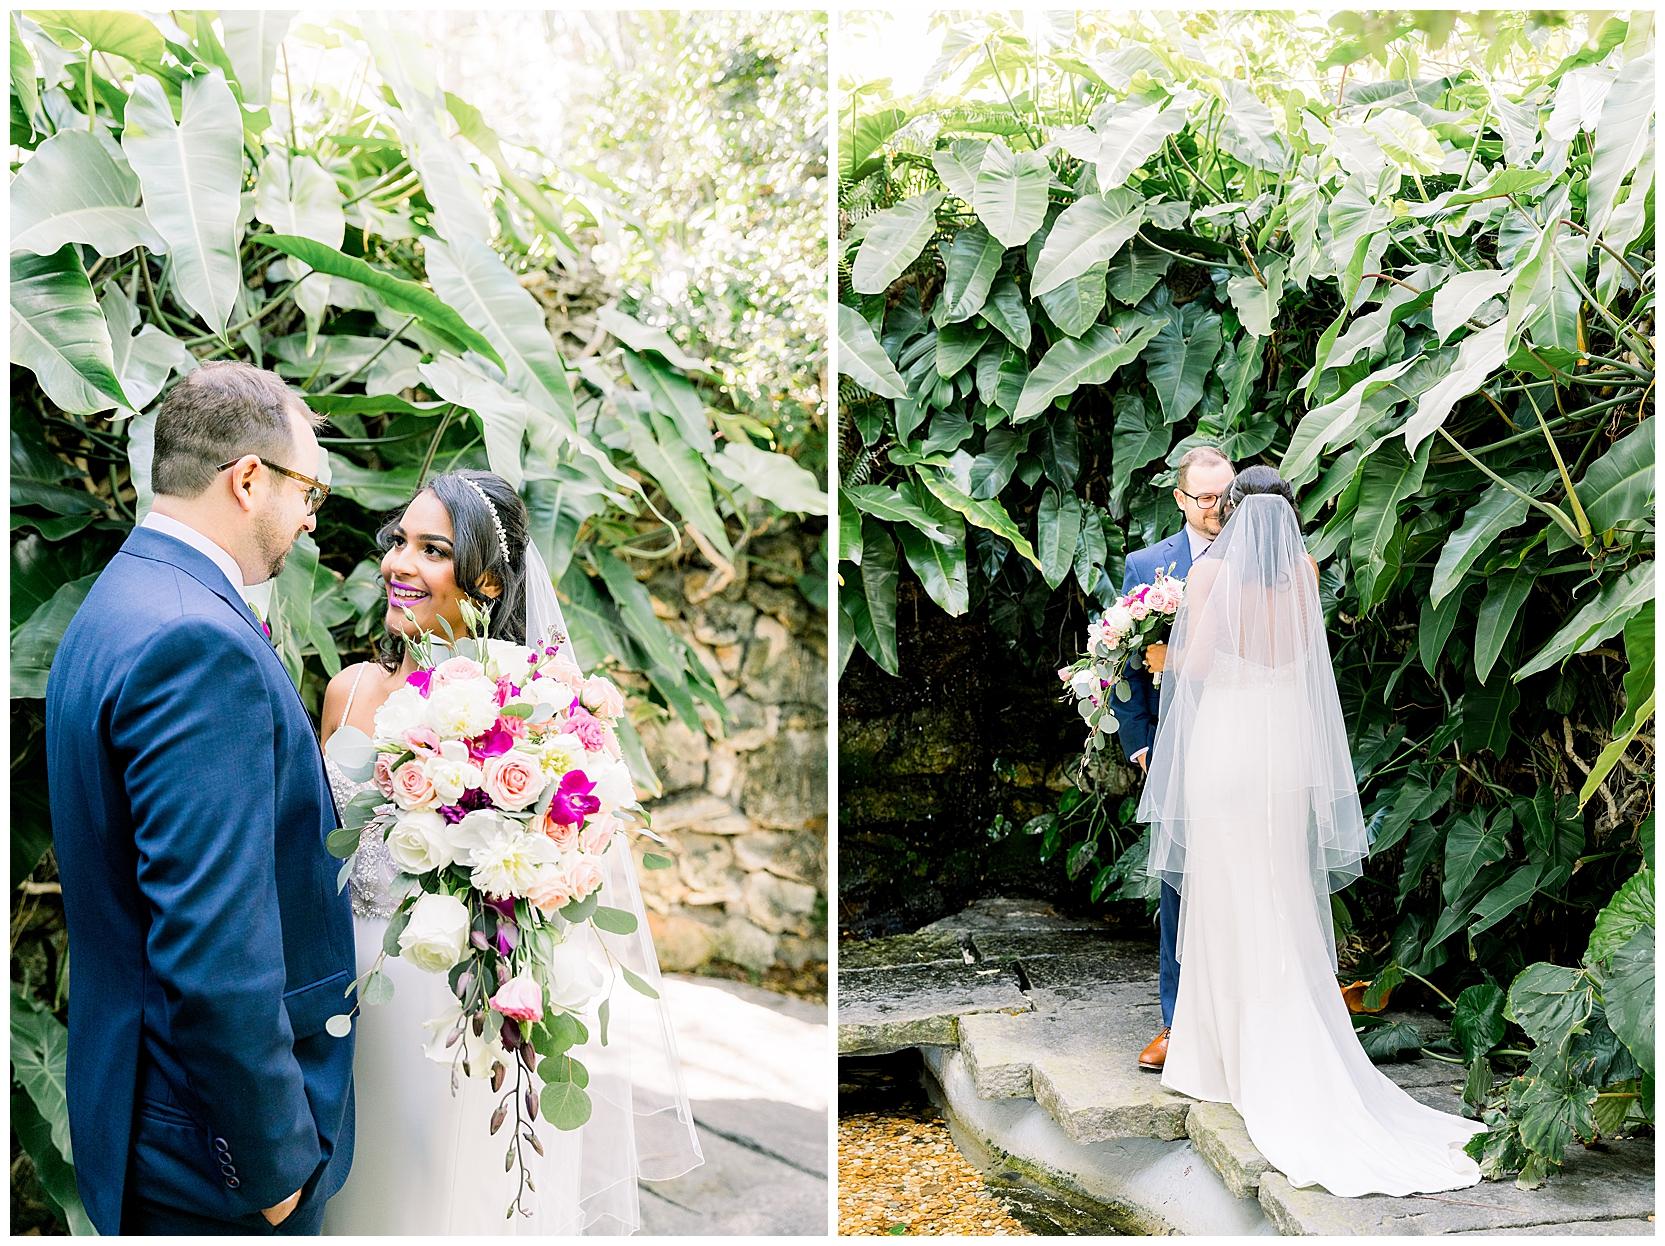 jessicafredericks_lakeland_tampa_wedding_purple_crazy hour_0018.jpg